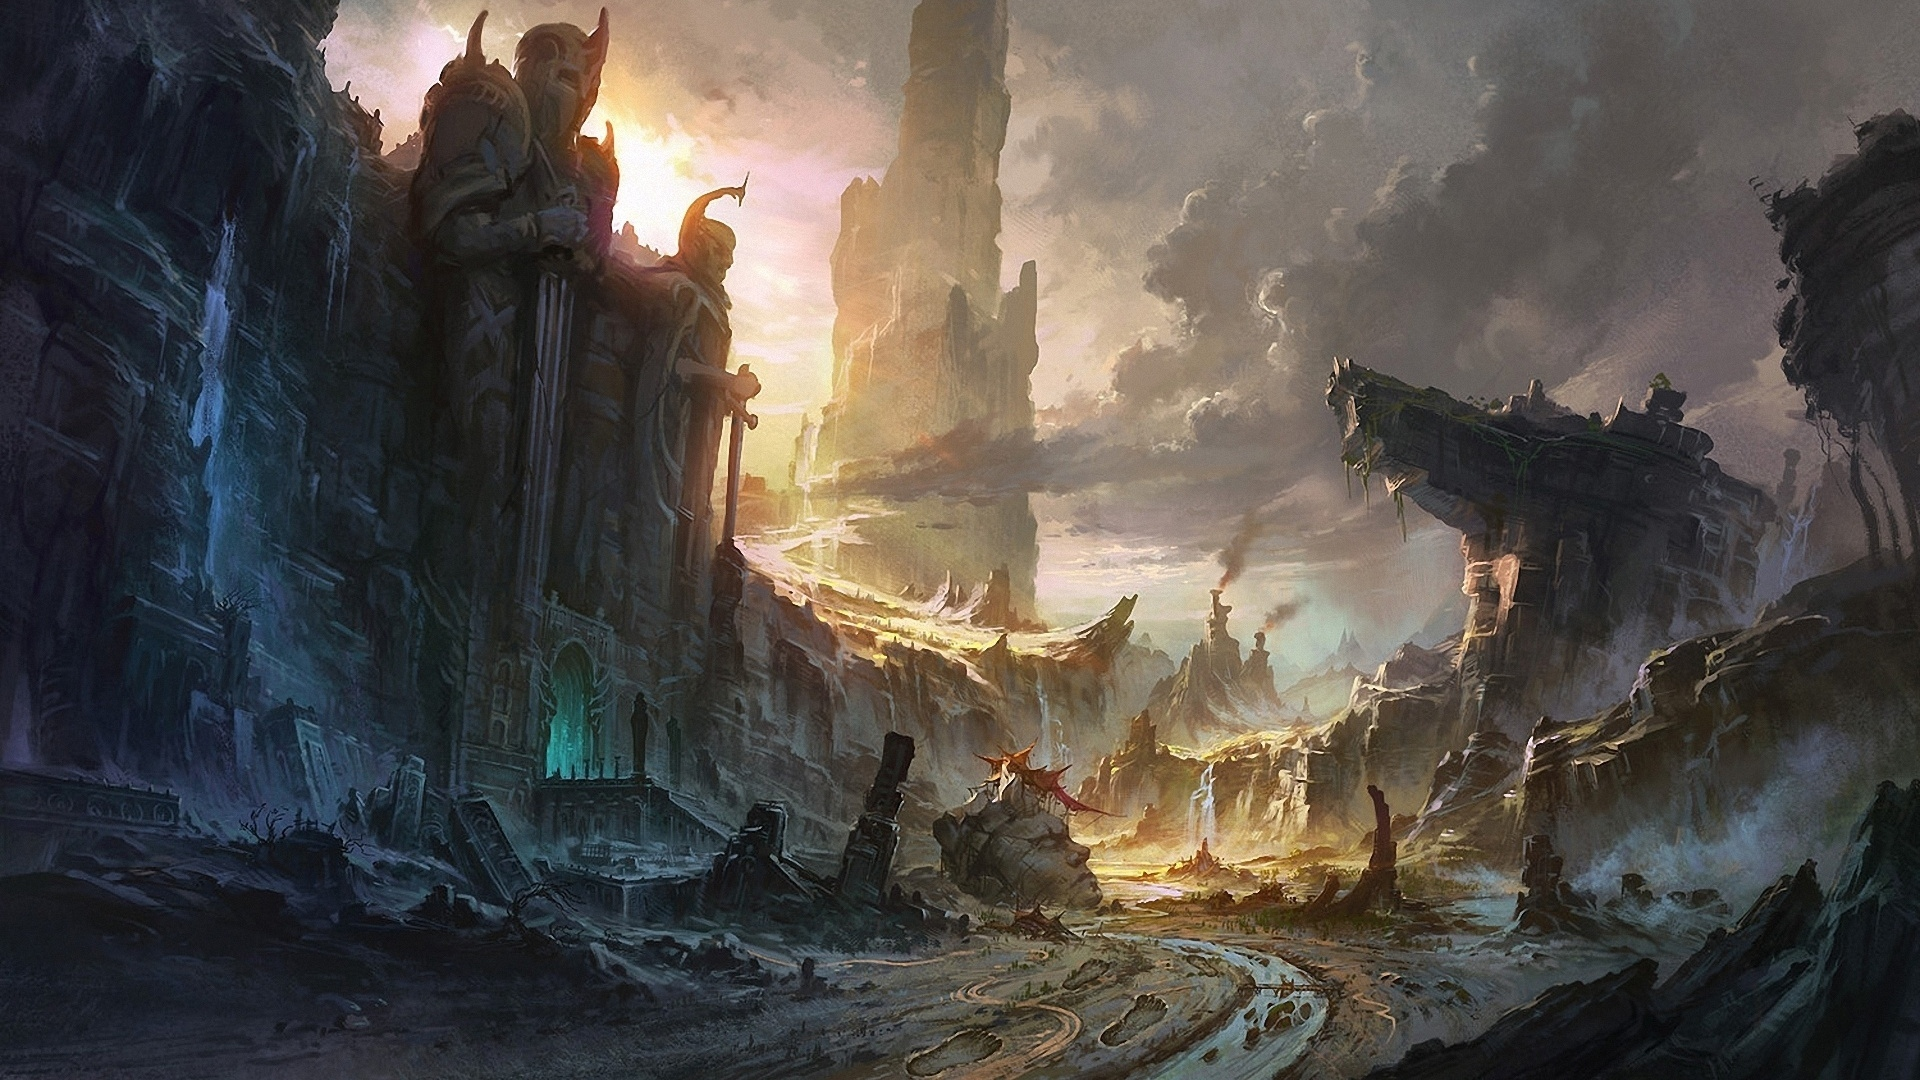 ancient-fortess-ruin-rock-debris-tower-statue.jpg